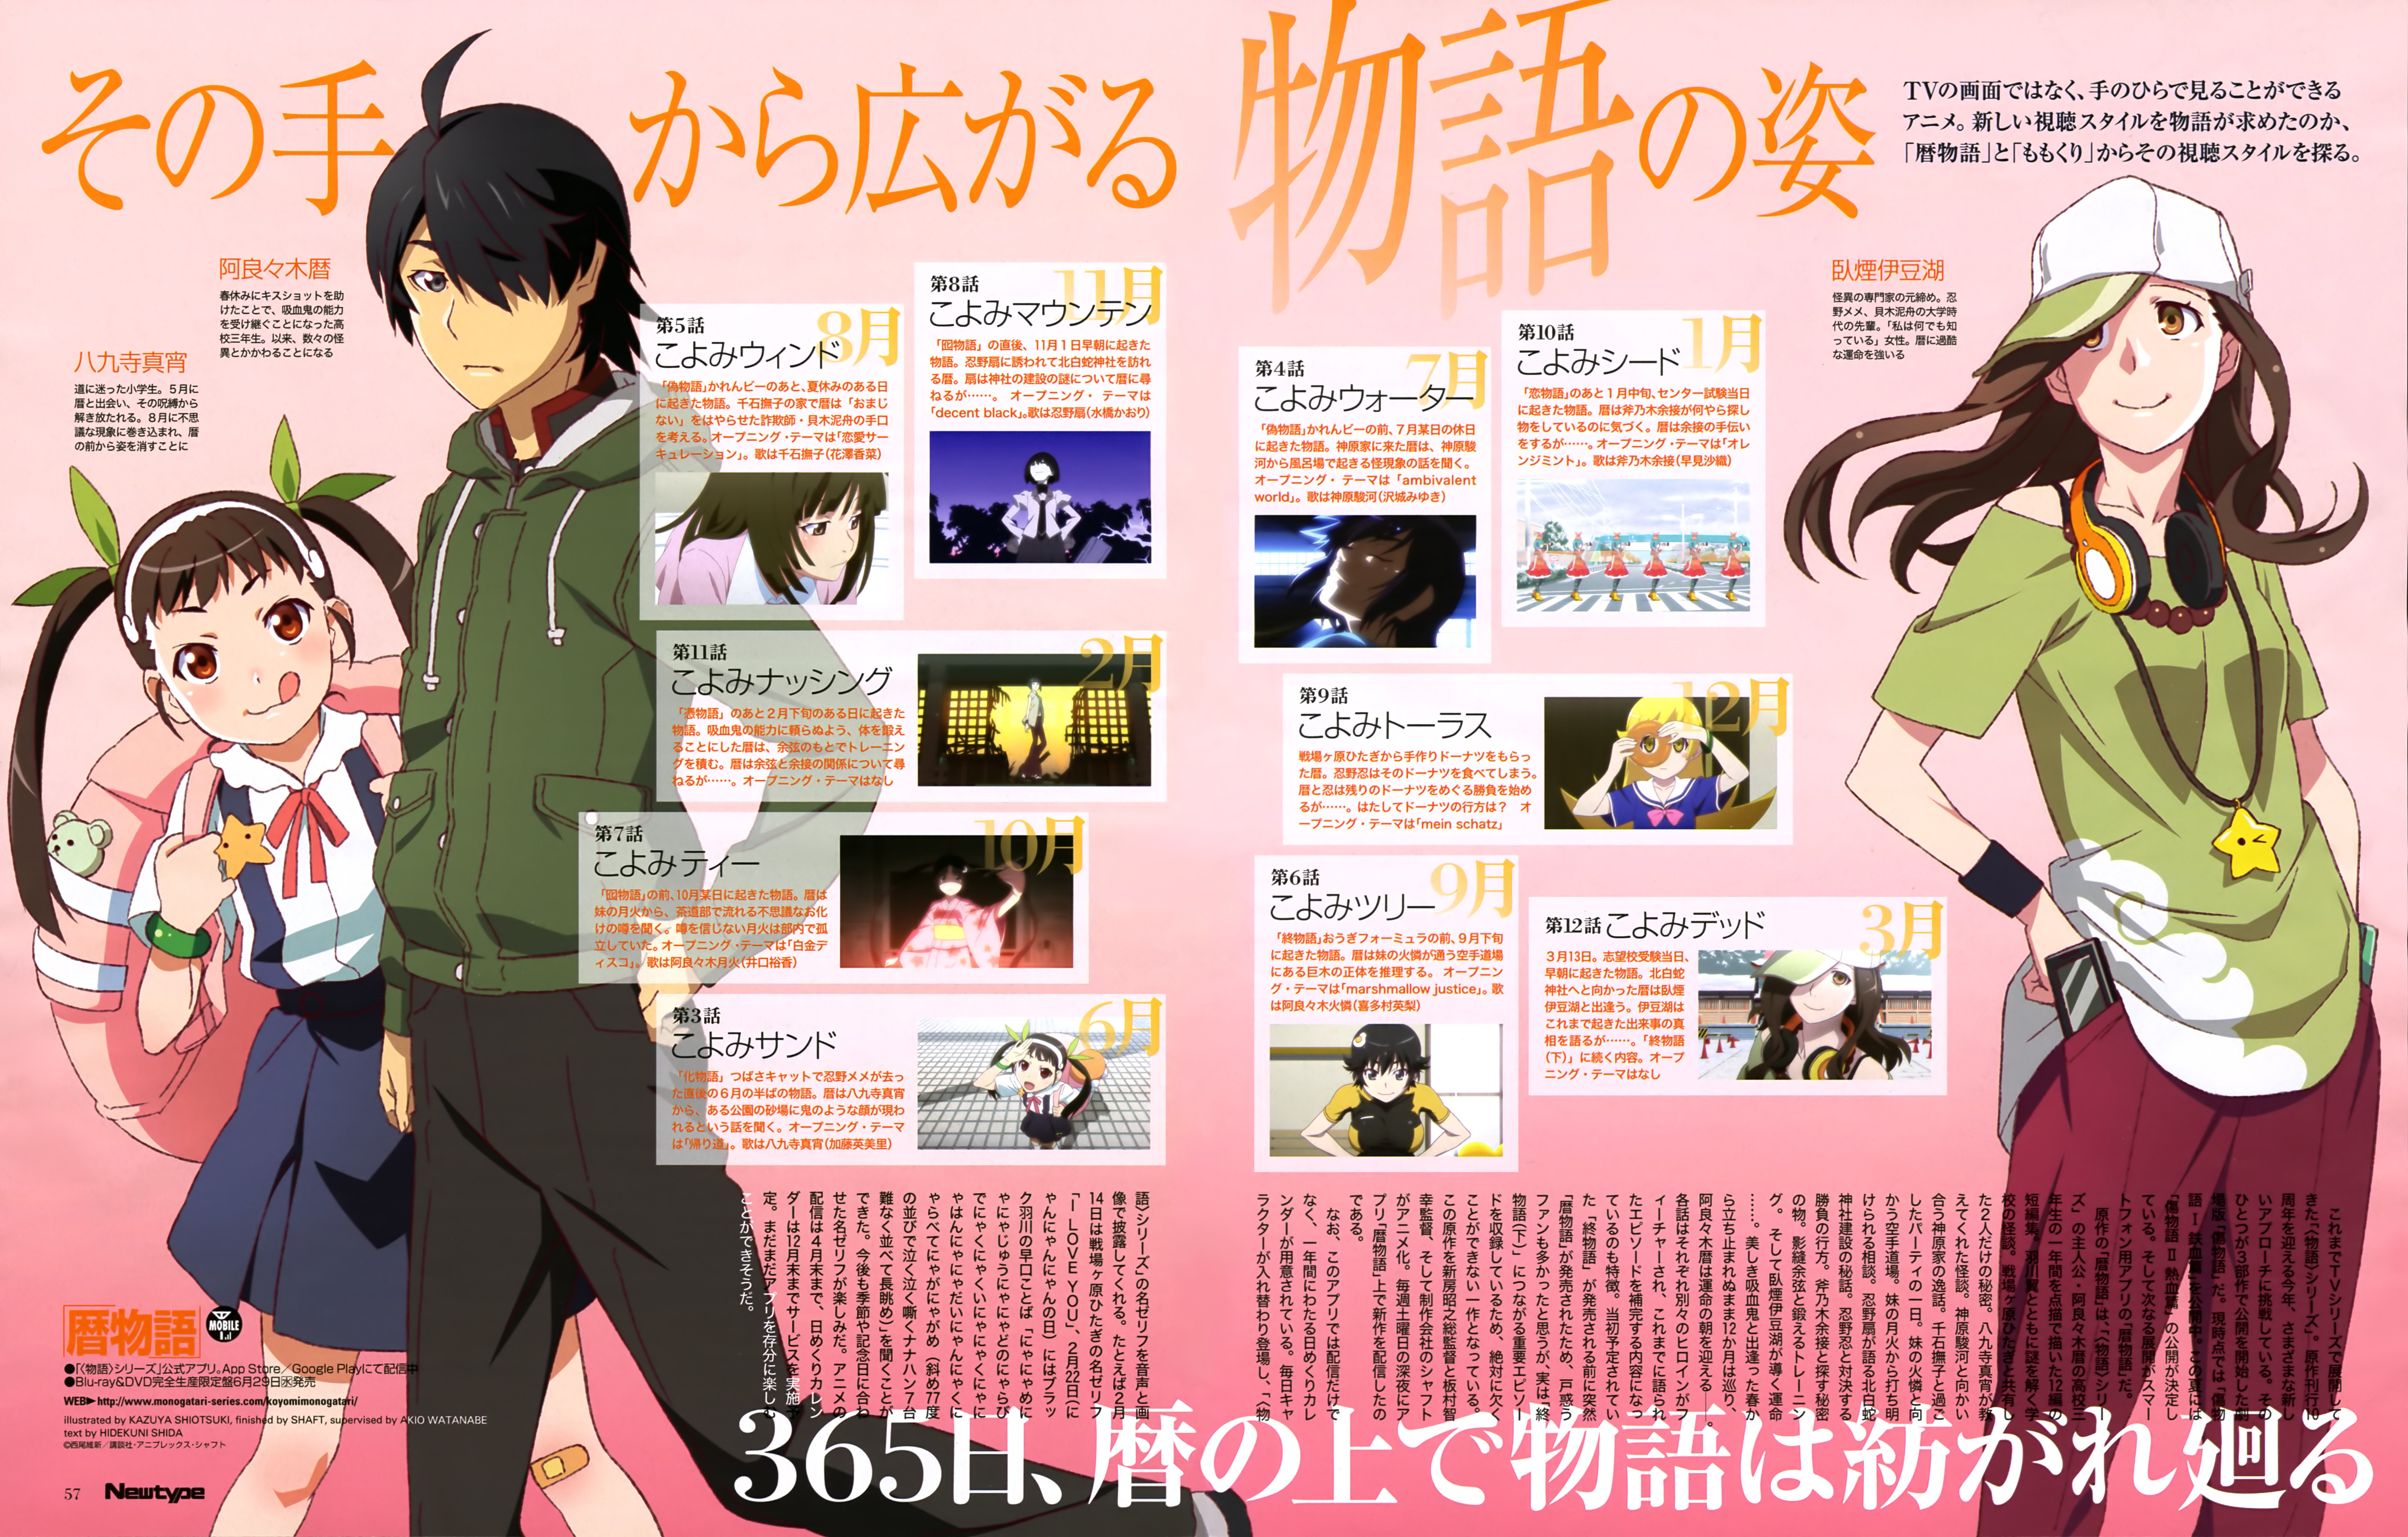 Koyomimonogatari anime visual